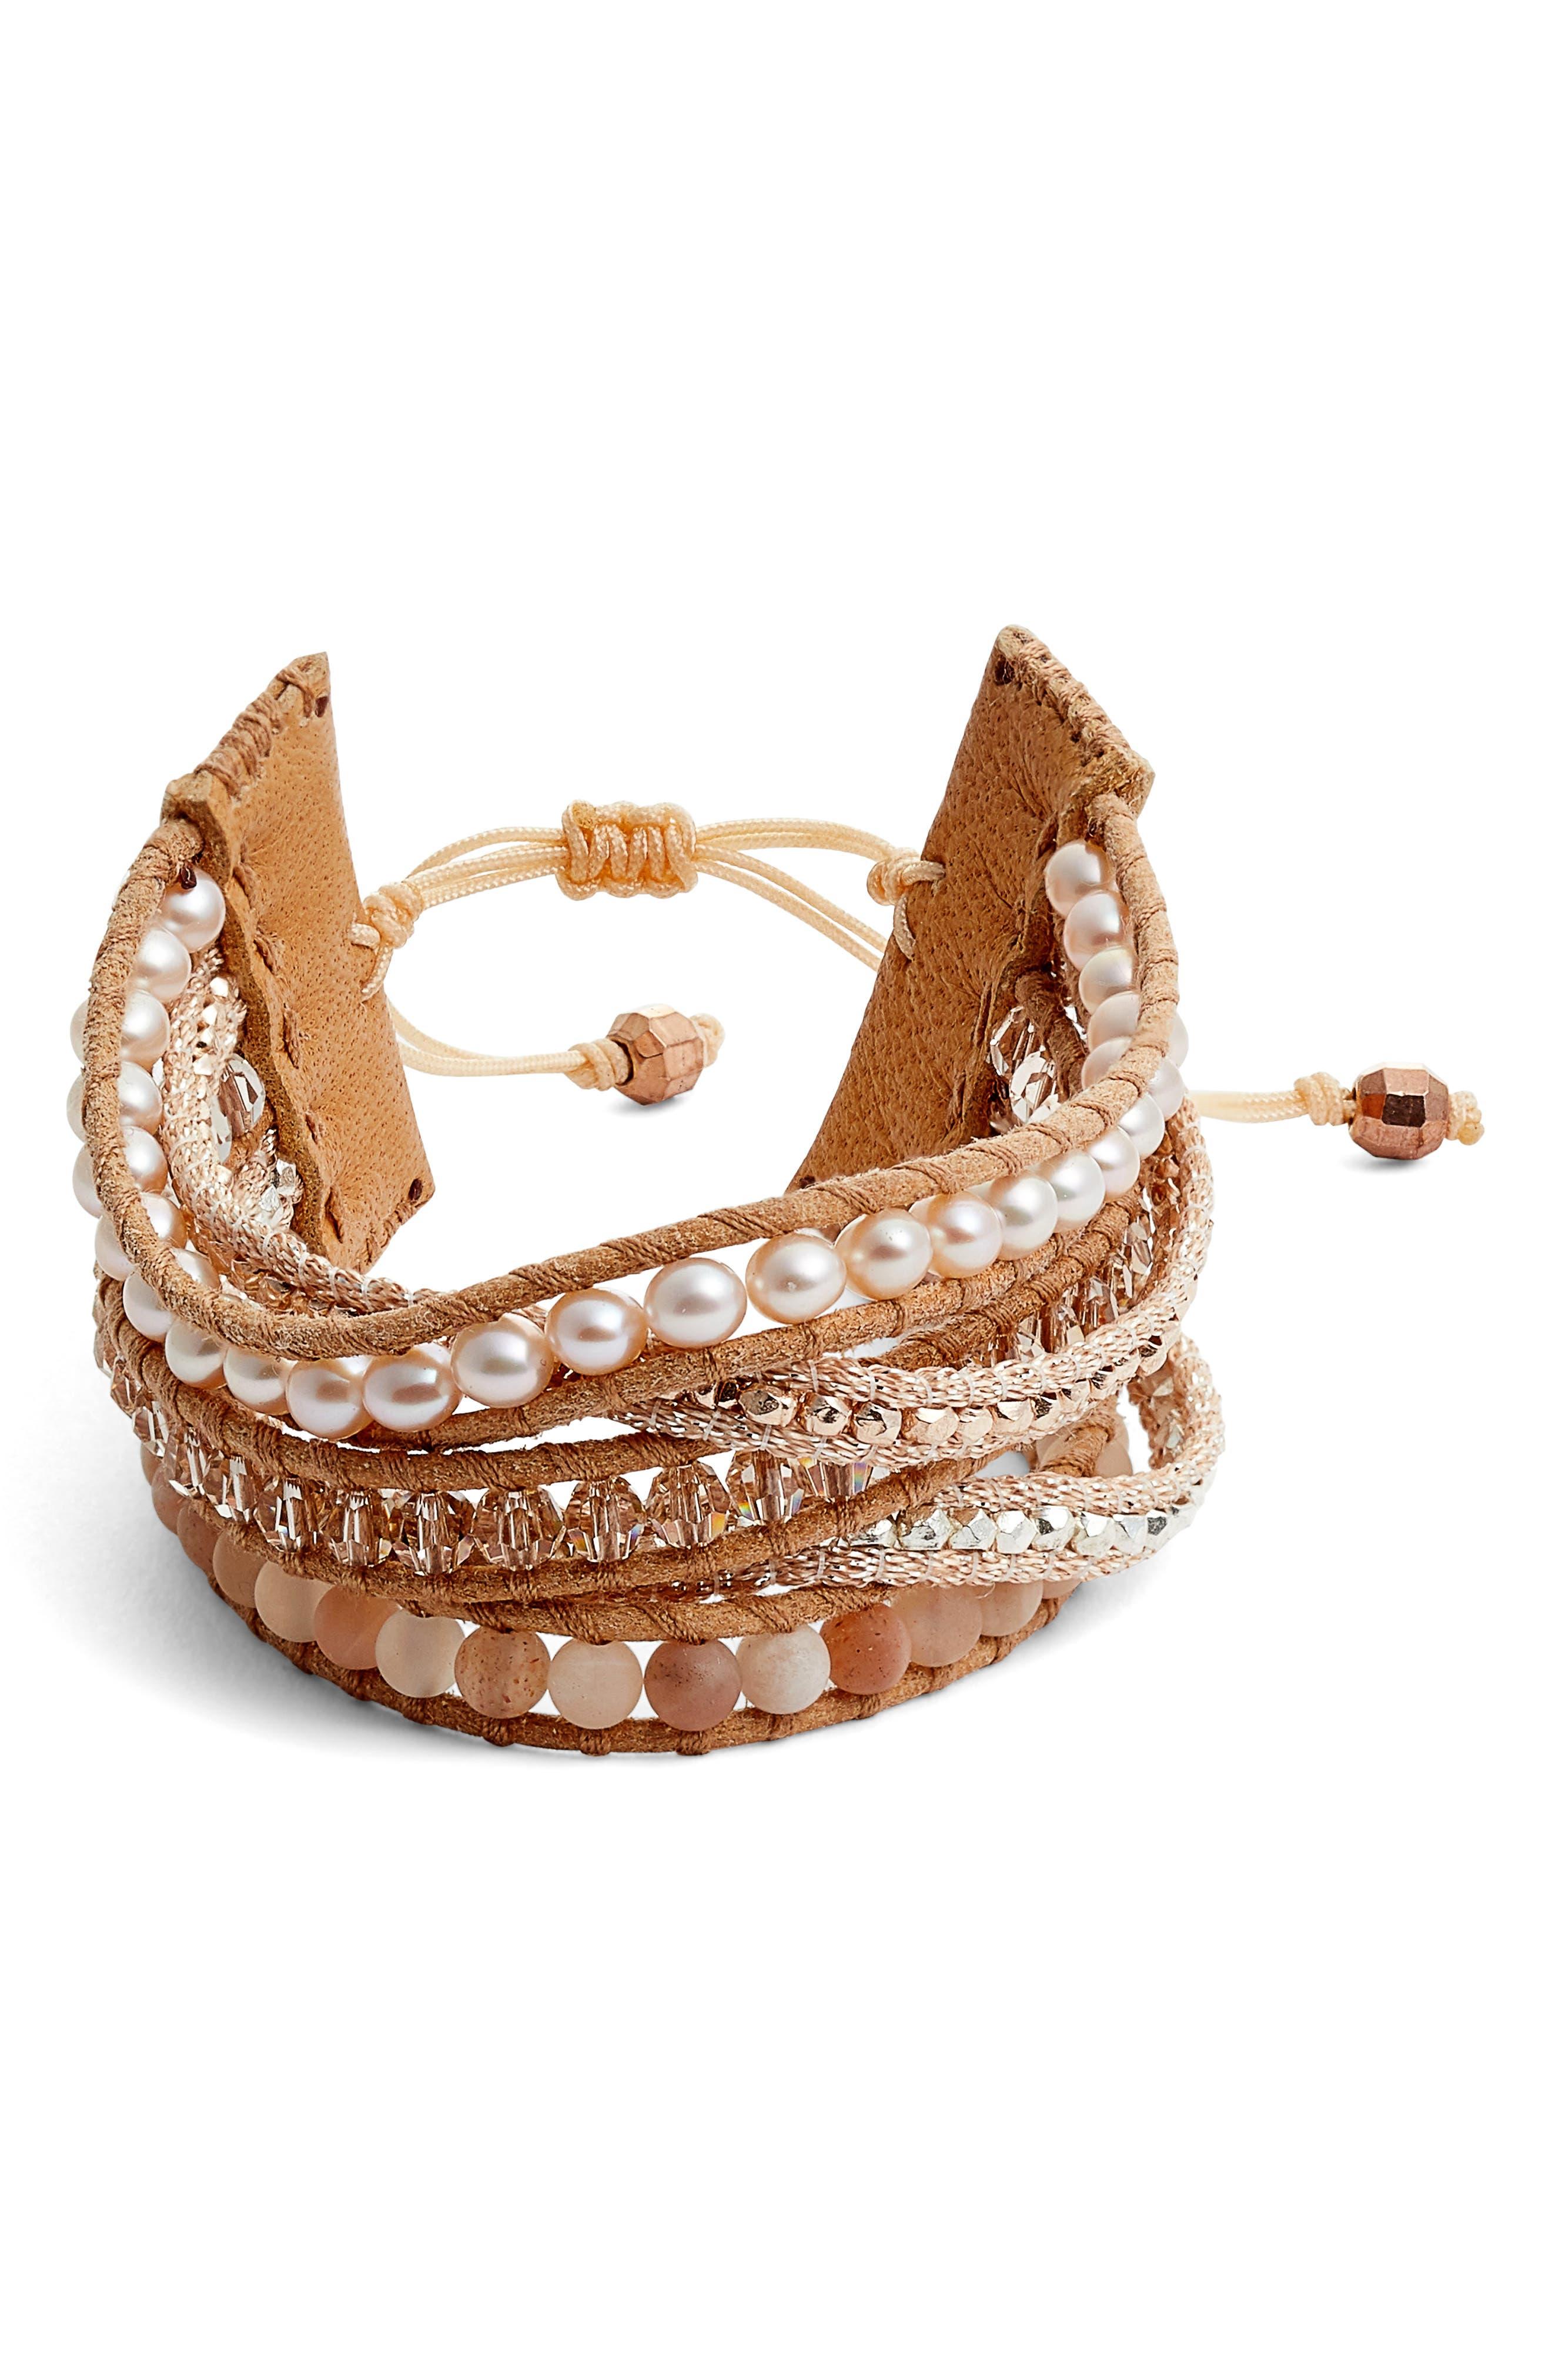 Multistrand Pull Tie Pearl Mix Bracelet,                             Main thumbnail 1, color,                             650